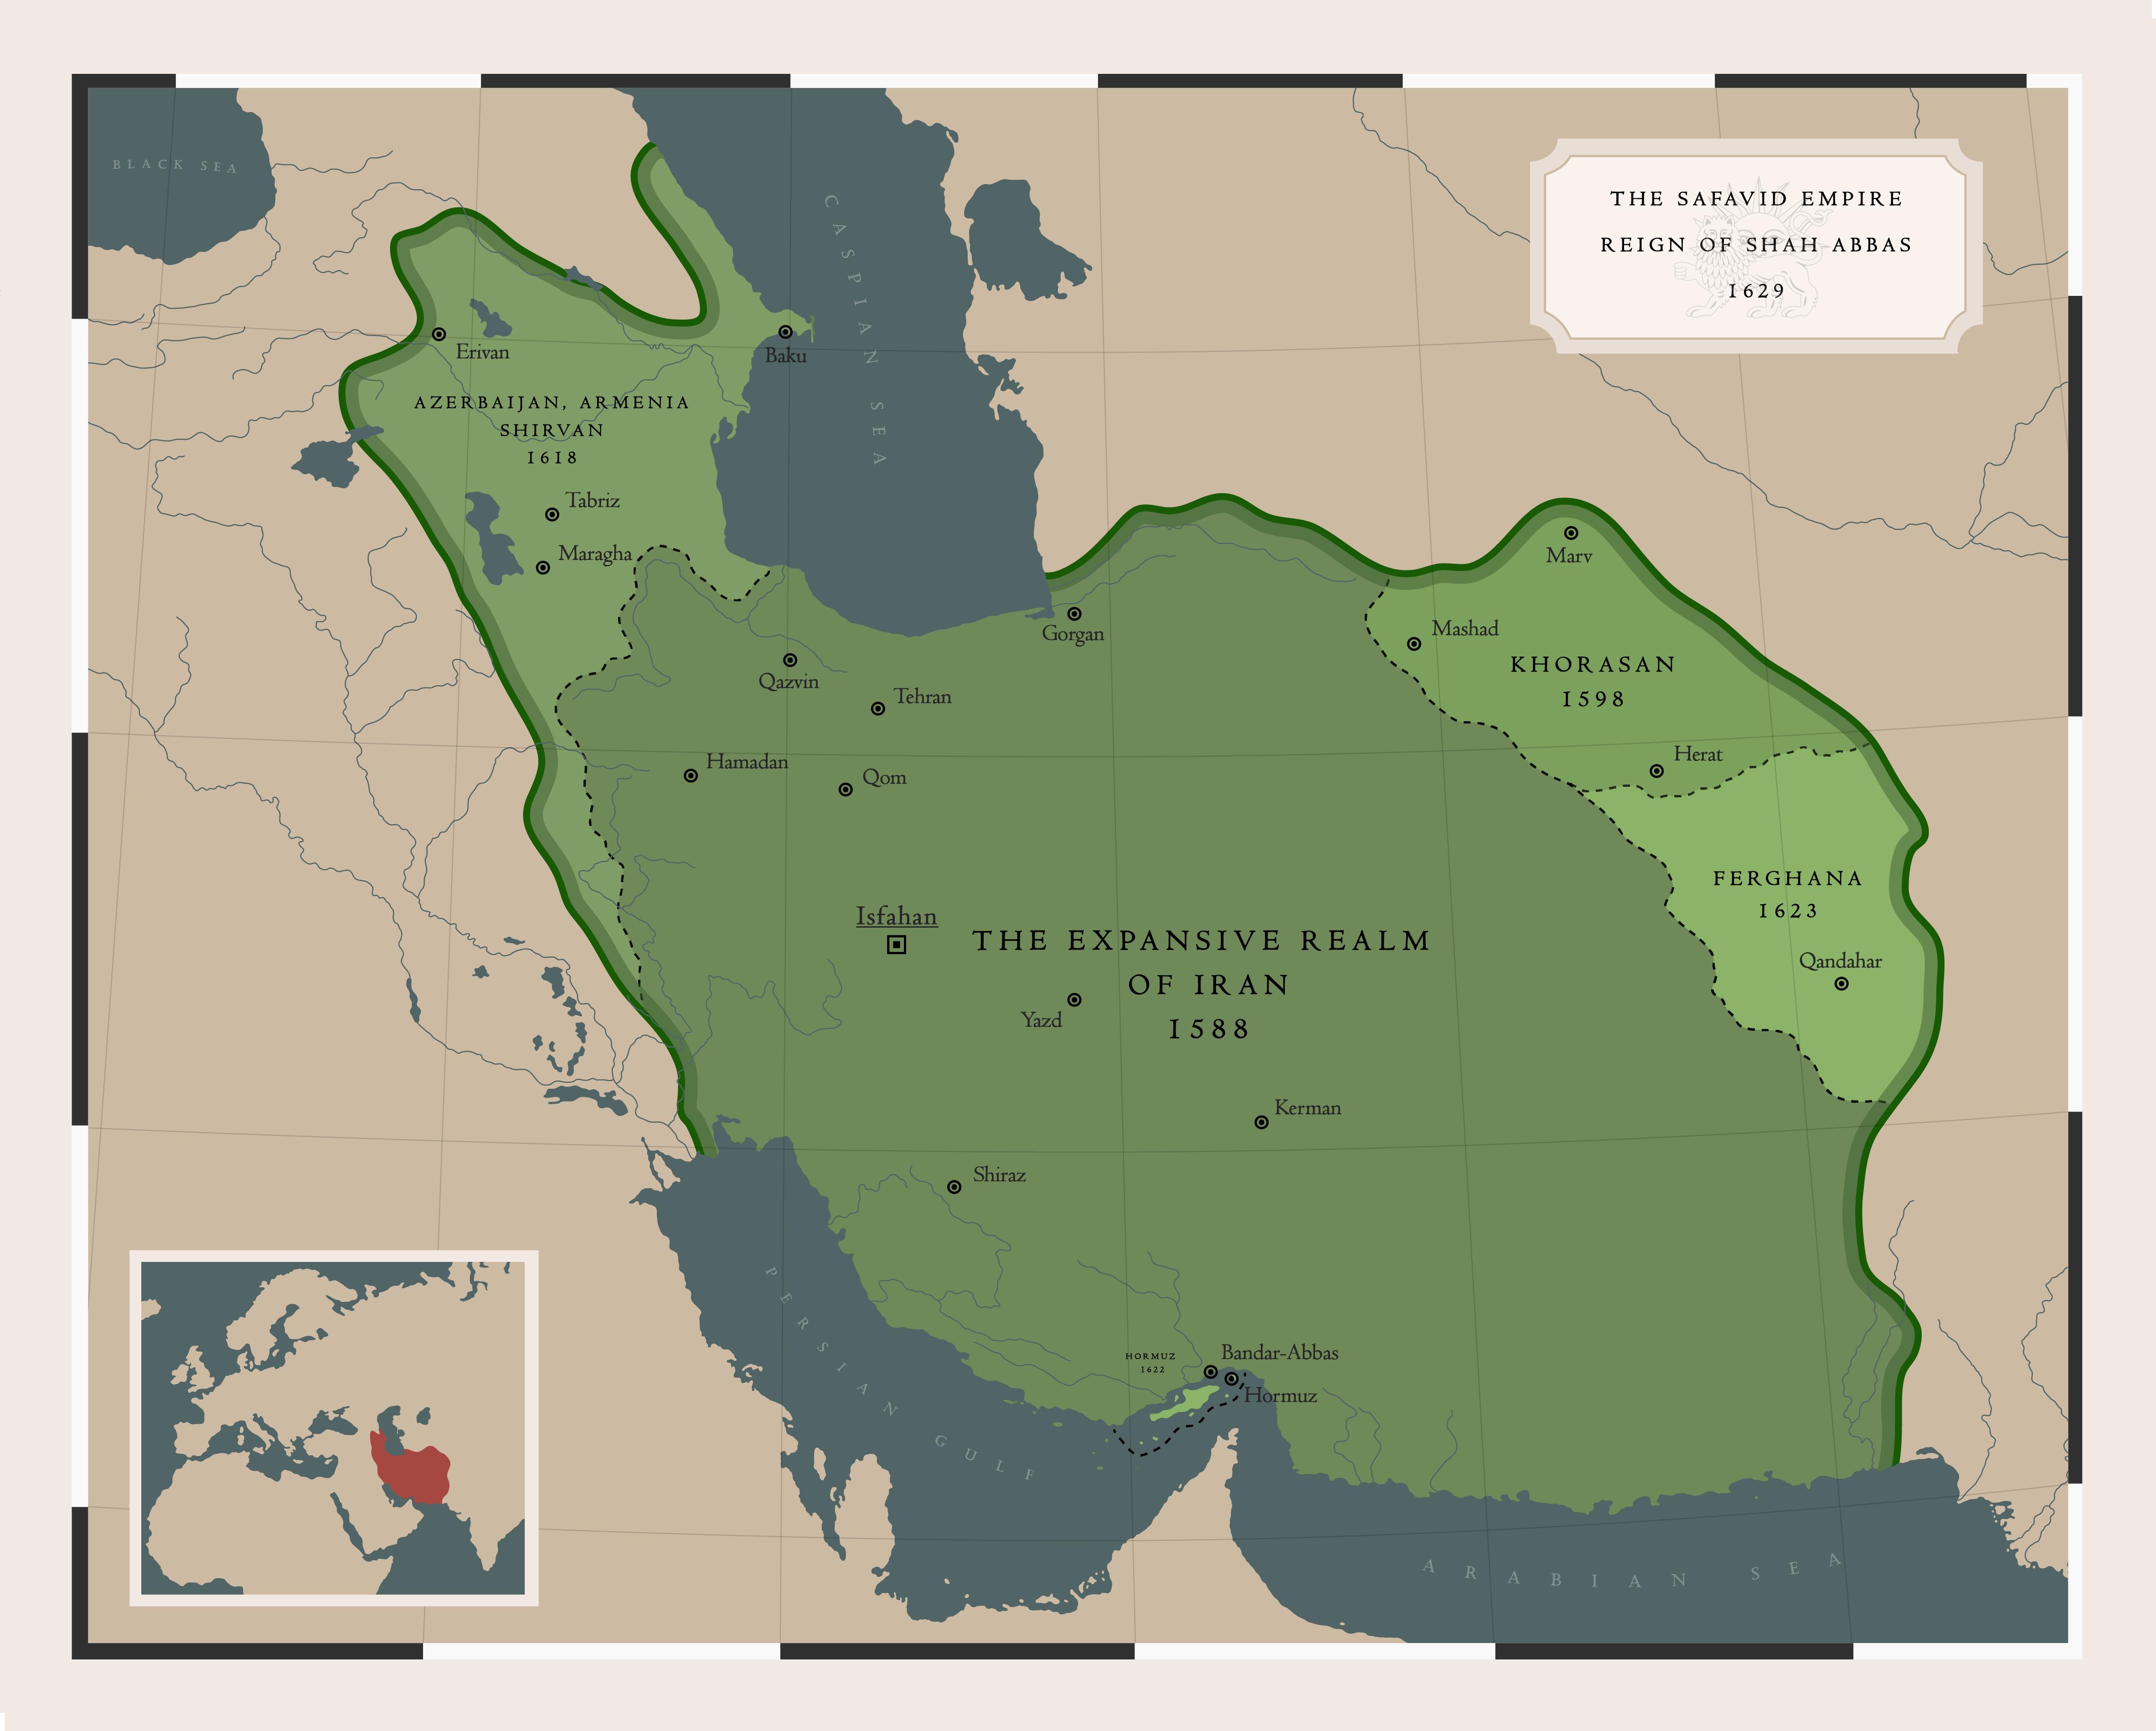 Abbas the Great - The Safavid Empire by ShahAbbas1571 on ... on british empire map, gunpowder empires, choson empire map, king solomon's empire map, kievan empire map, roman empire, qajar dynasty, tokugawa map, inca empire, ming dynasty map, holy roman empire, seleucid empire, sunni empire map, kangxi empire map, aztec empire map, pahlavi dynasty, dutch empire map, ming dynasty, ottoman empire, achaemenid empire, songhai empire map, timurid empire map, mongol empire, byzantine empire, world map, sassanid empire, istanbul map, almohad empire map, parthian empire, inca empire map, islamic empire map, peter the great empire map, mughal empire, spanish empire, pallava empire map, russian empire, songhai empire, qing dynasty map,